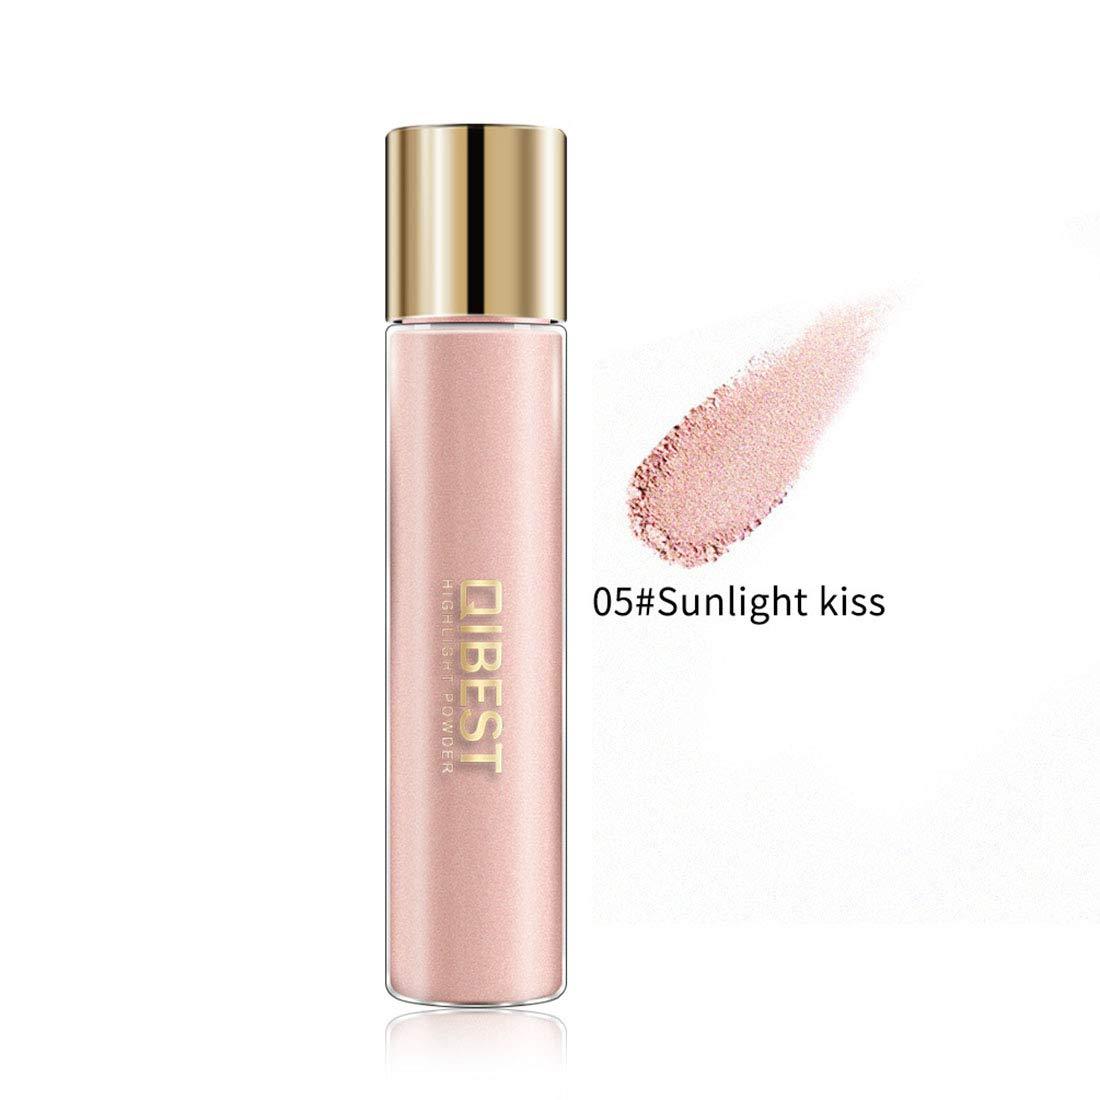 Msliy Highlighter Powder Waterproof High-Light Iluminador Brighten Face Eyes Glow Powder Eye Shadow Grooming Face Cosmetics